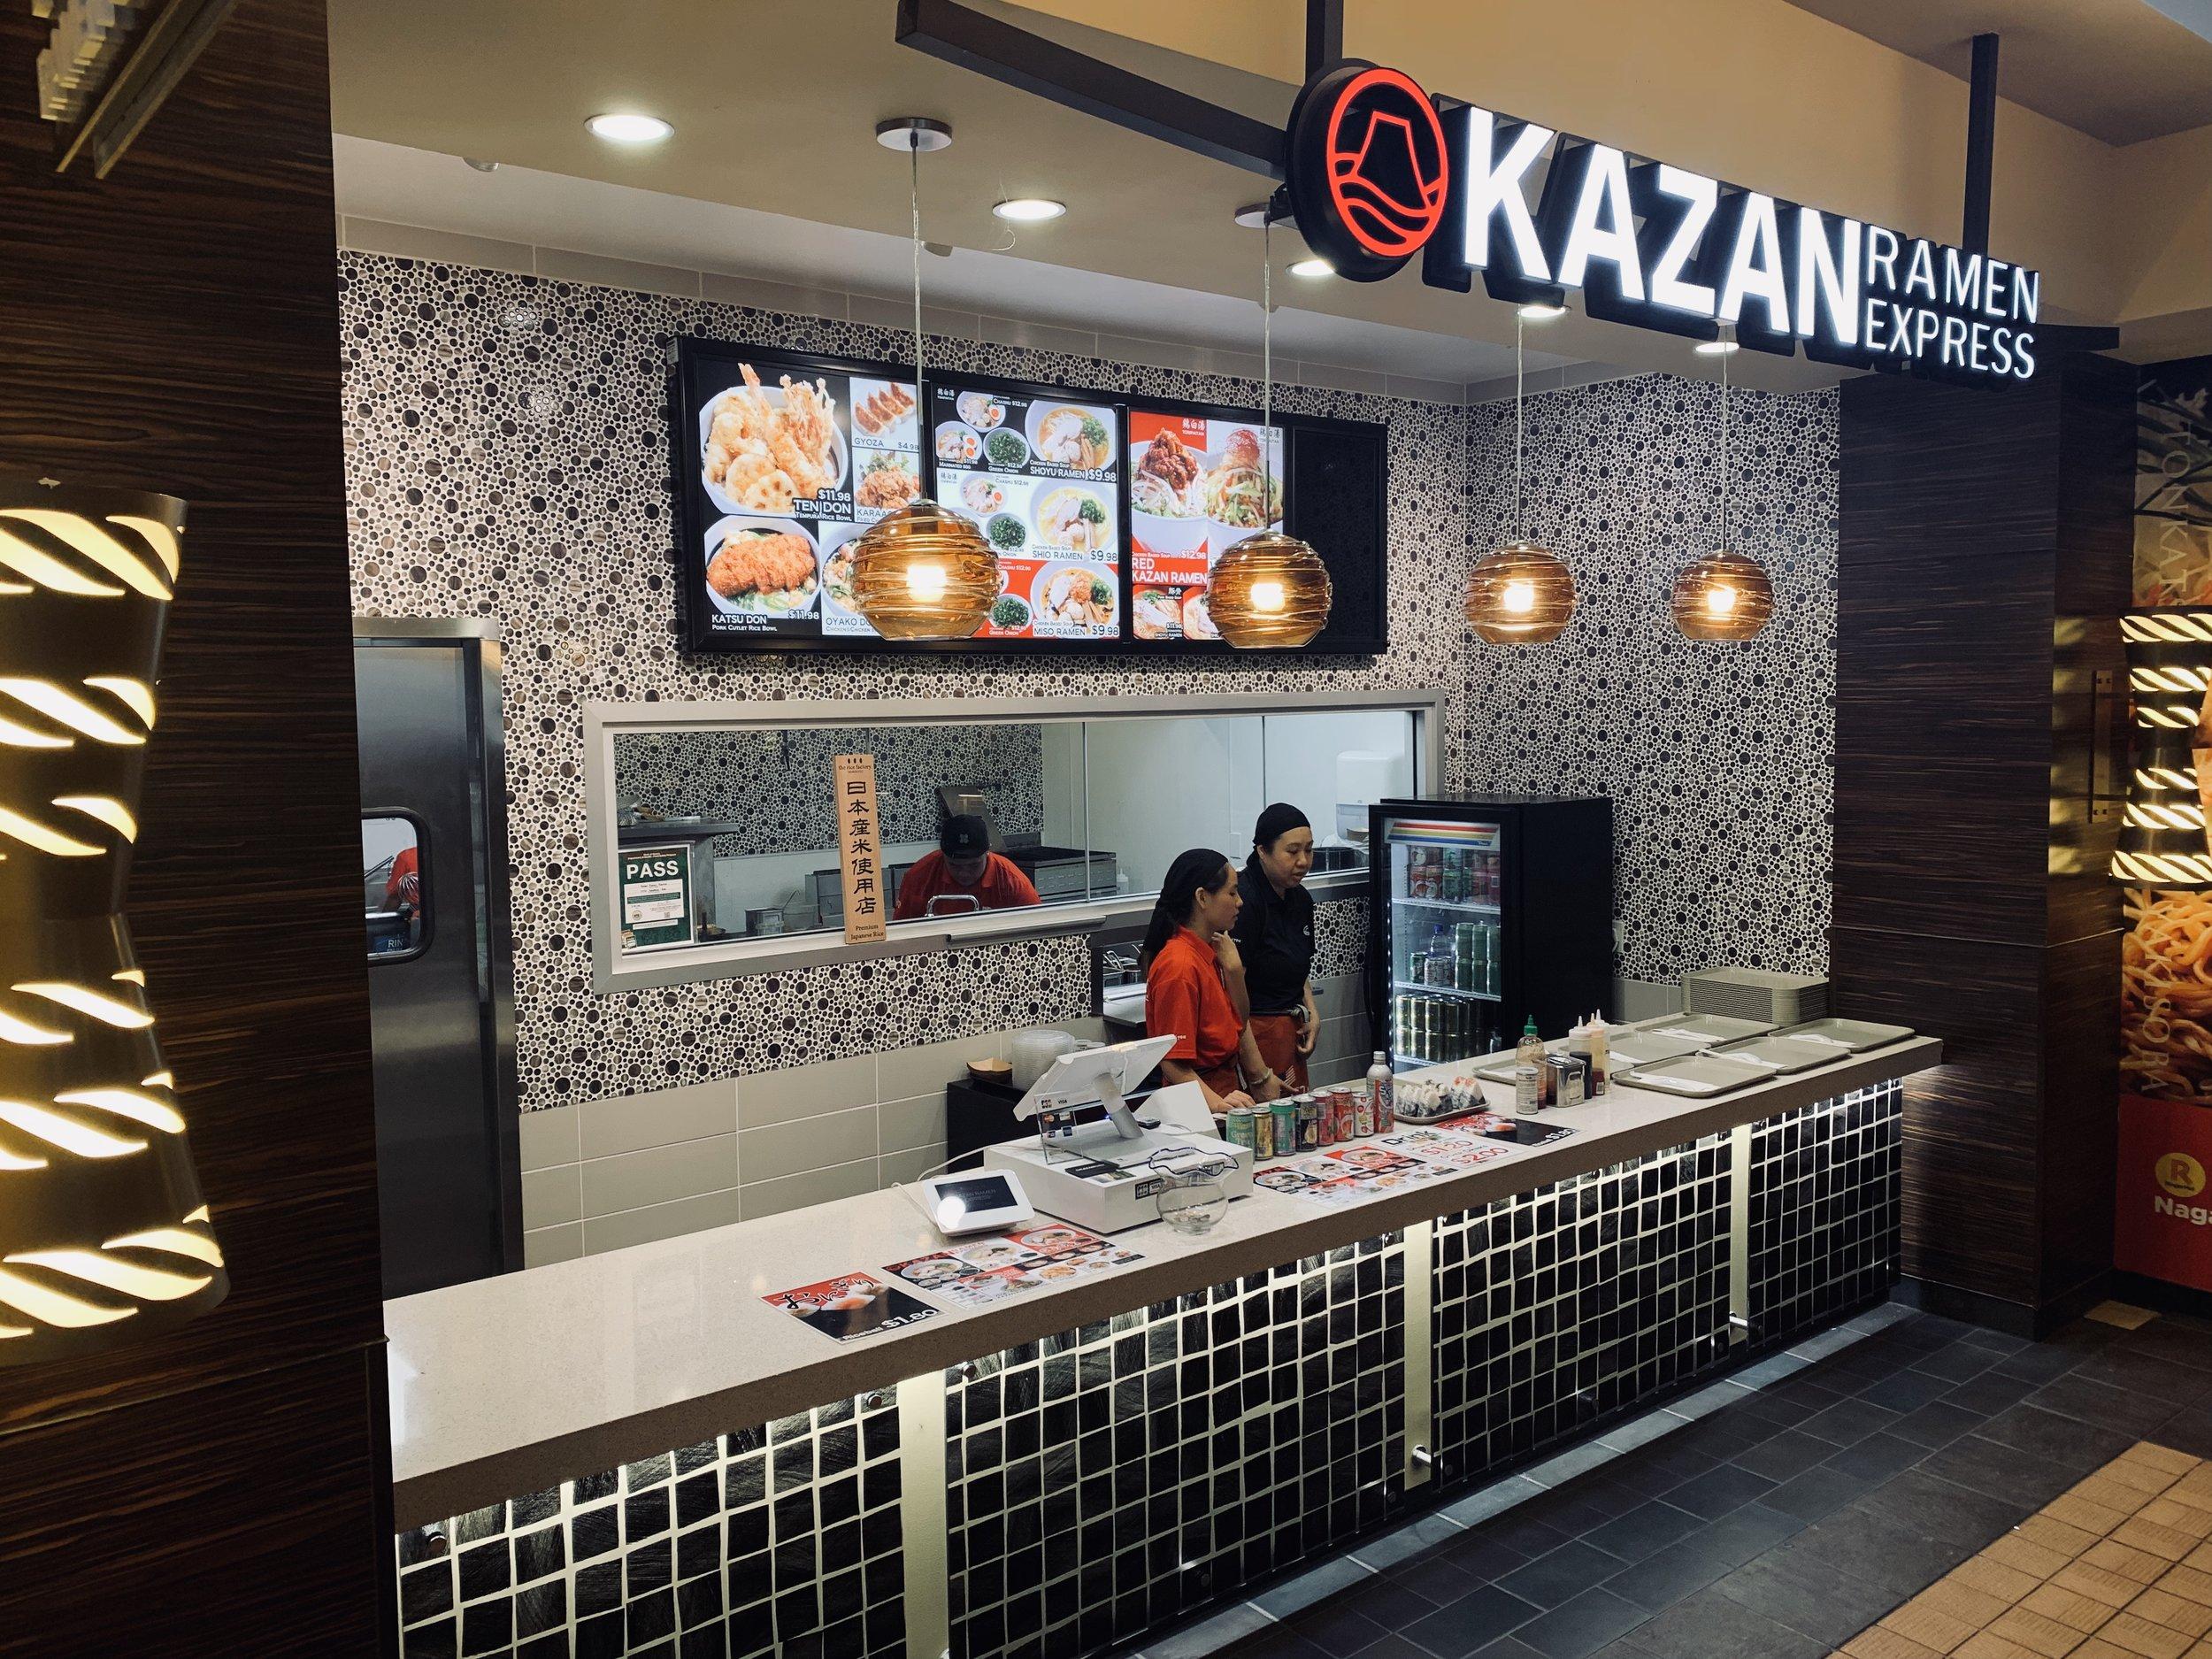 Royal Hawaiian Center Kazan Ramen Express - Commercial high-traffic counter tops with under lighting.